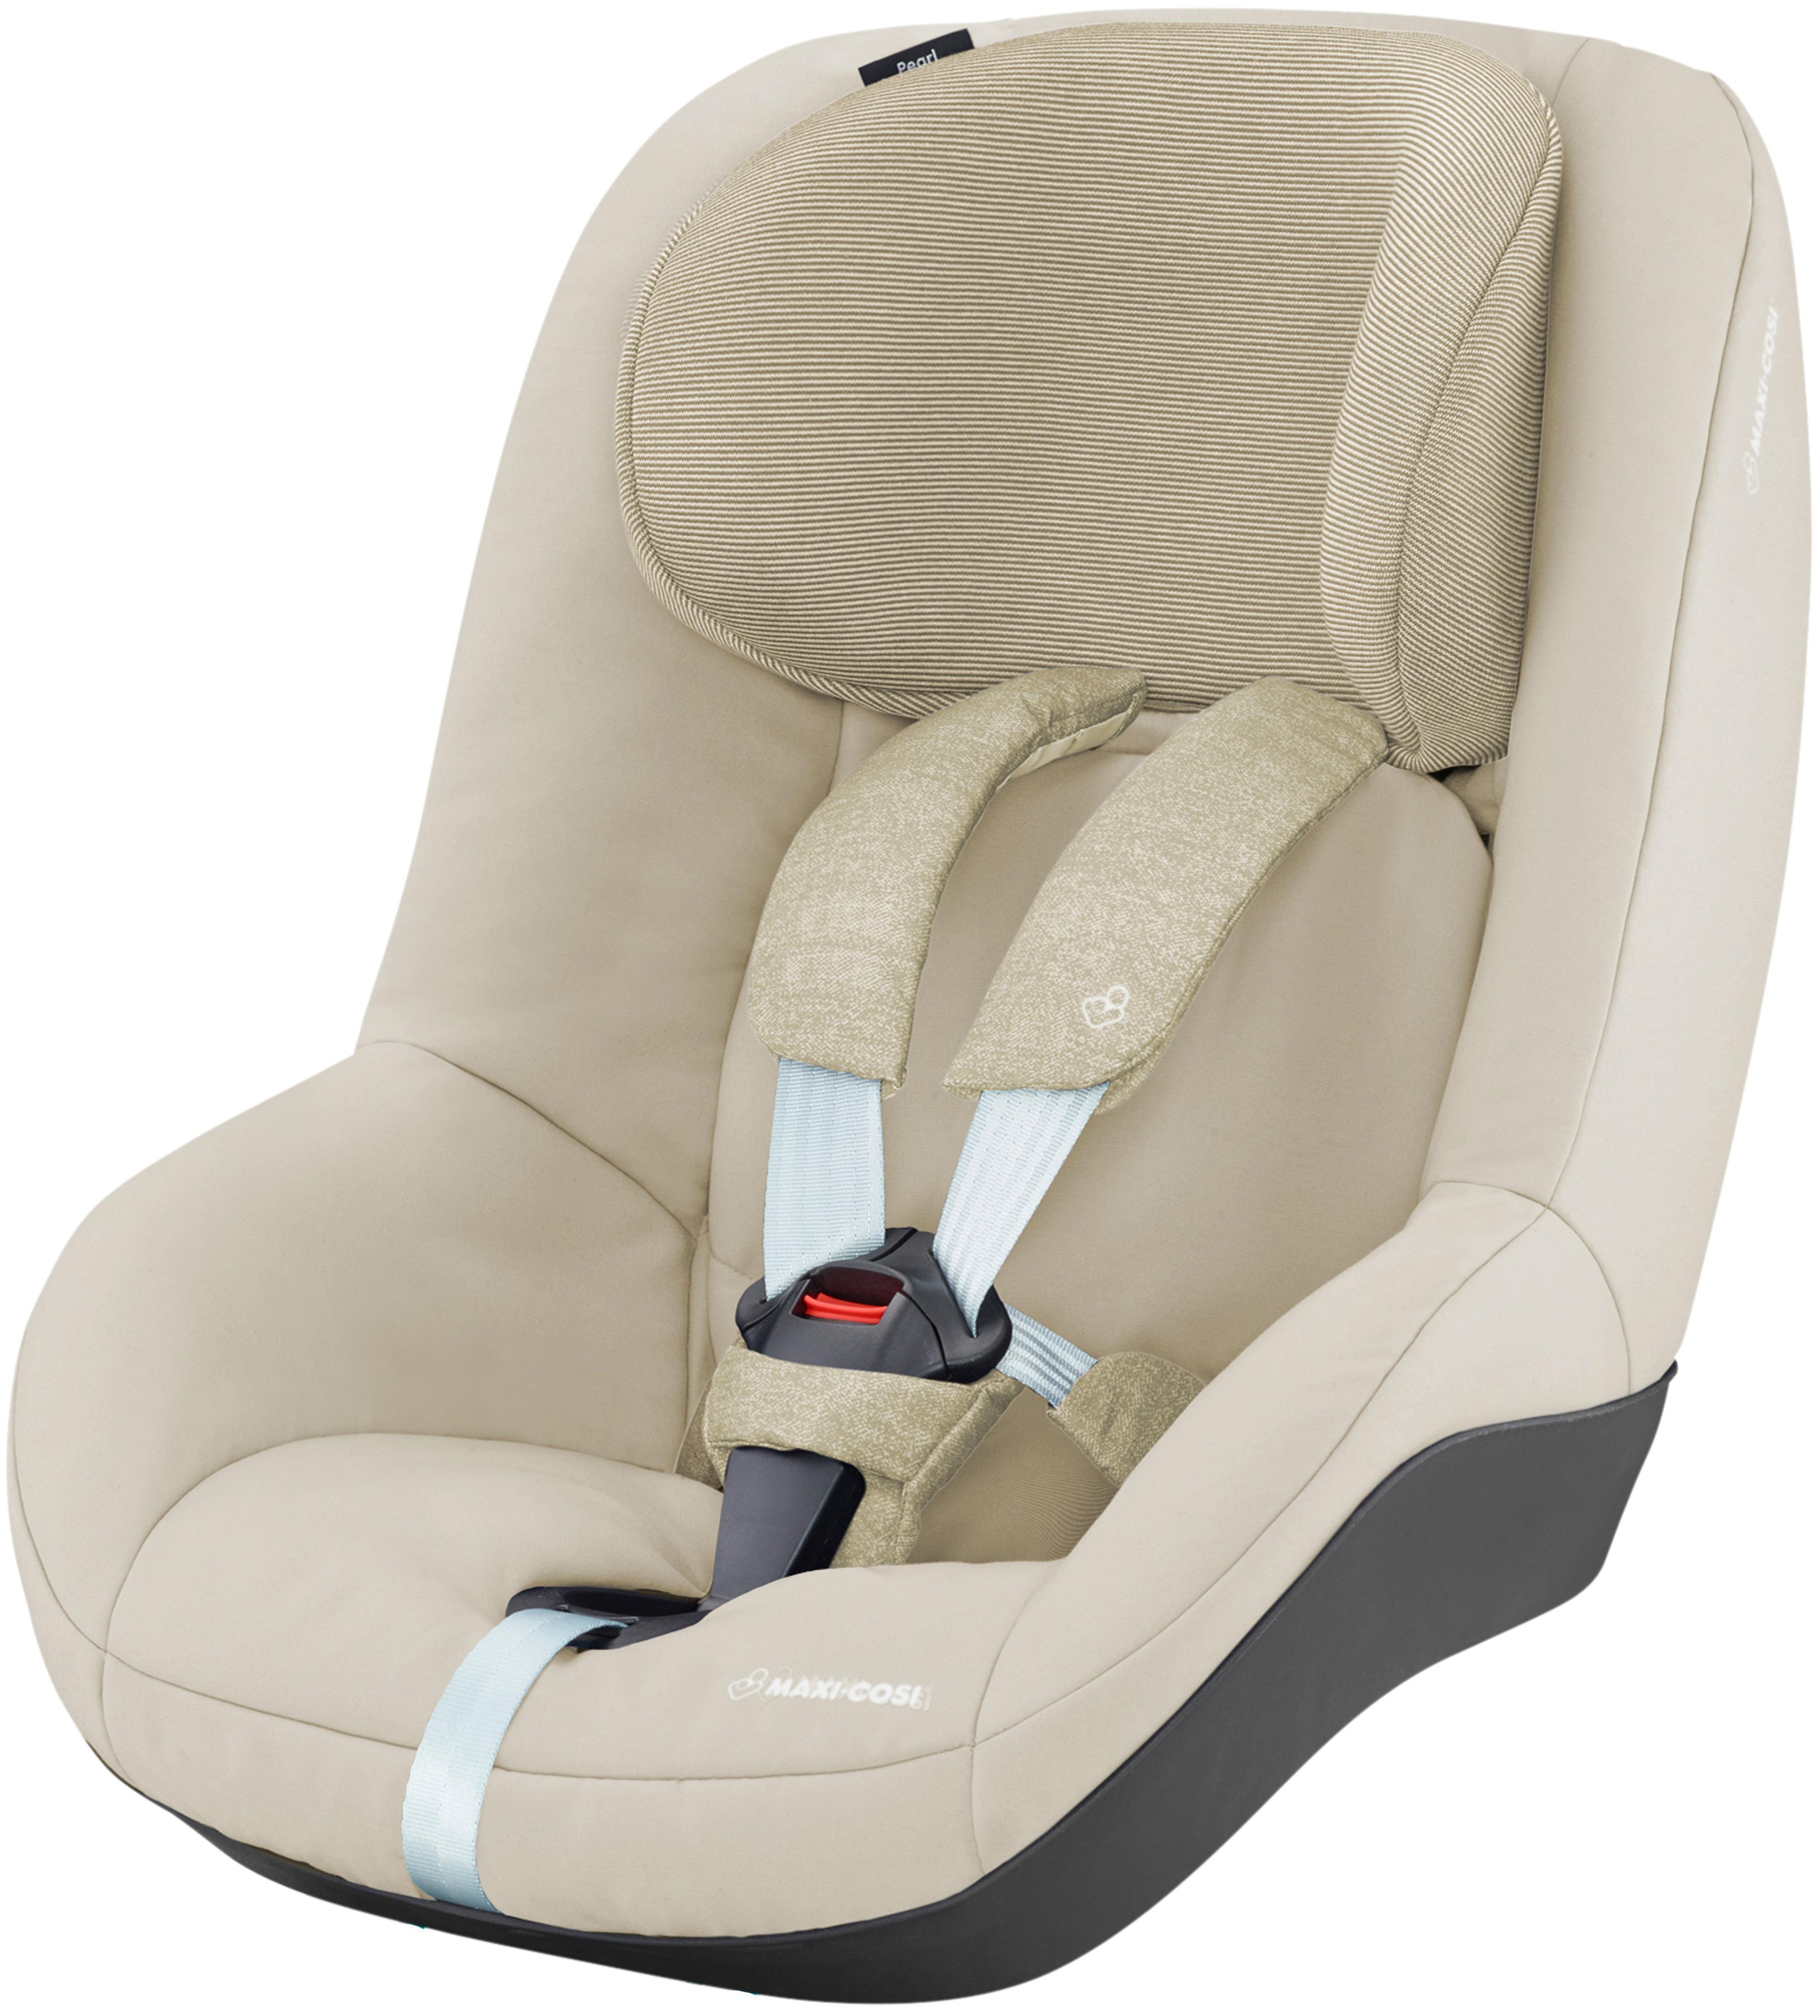 Maxi-Cosi Pearl Child Car Seat - Nomad